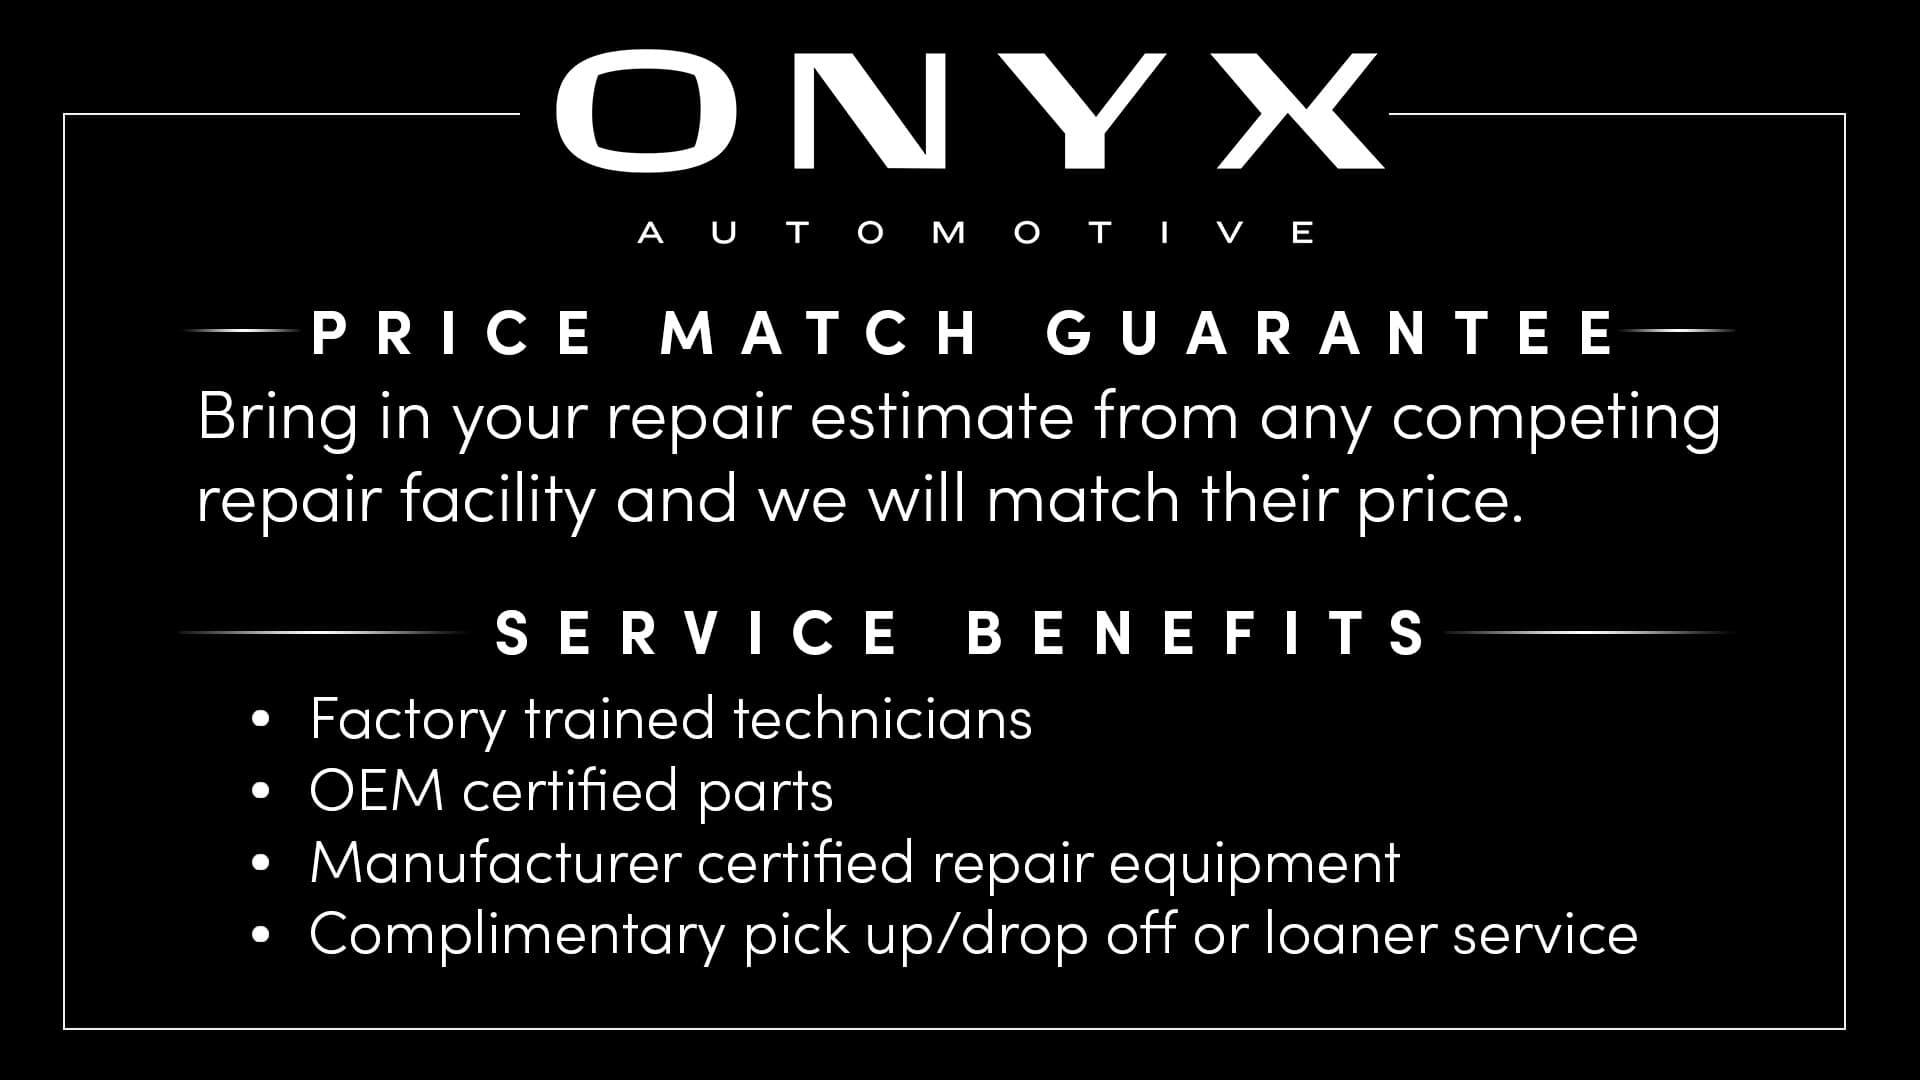 onyx price match guarantee tv